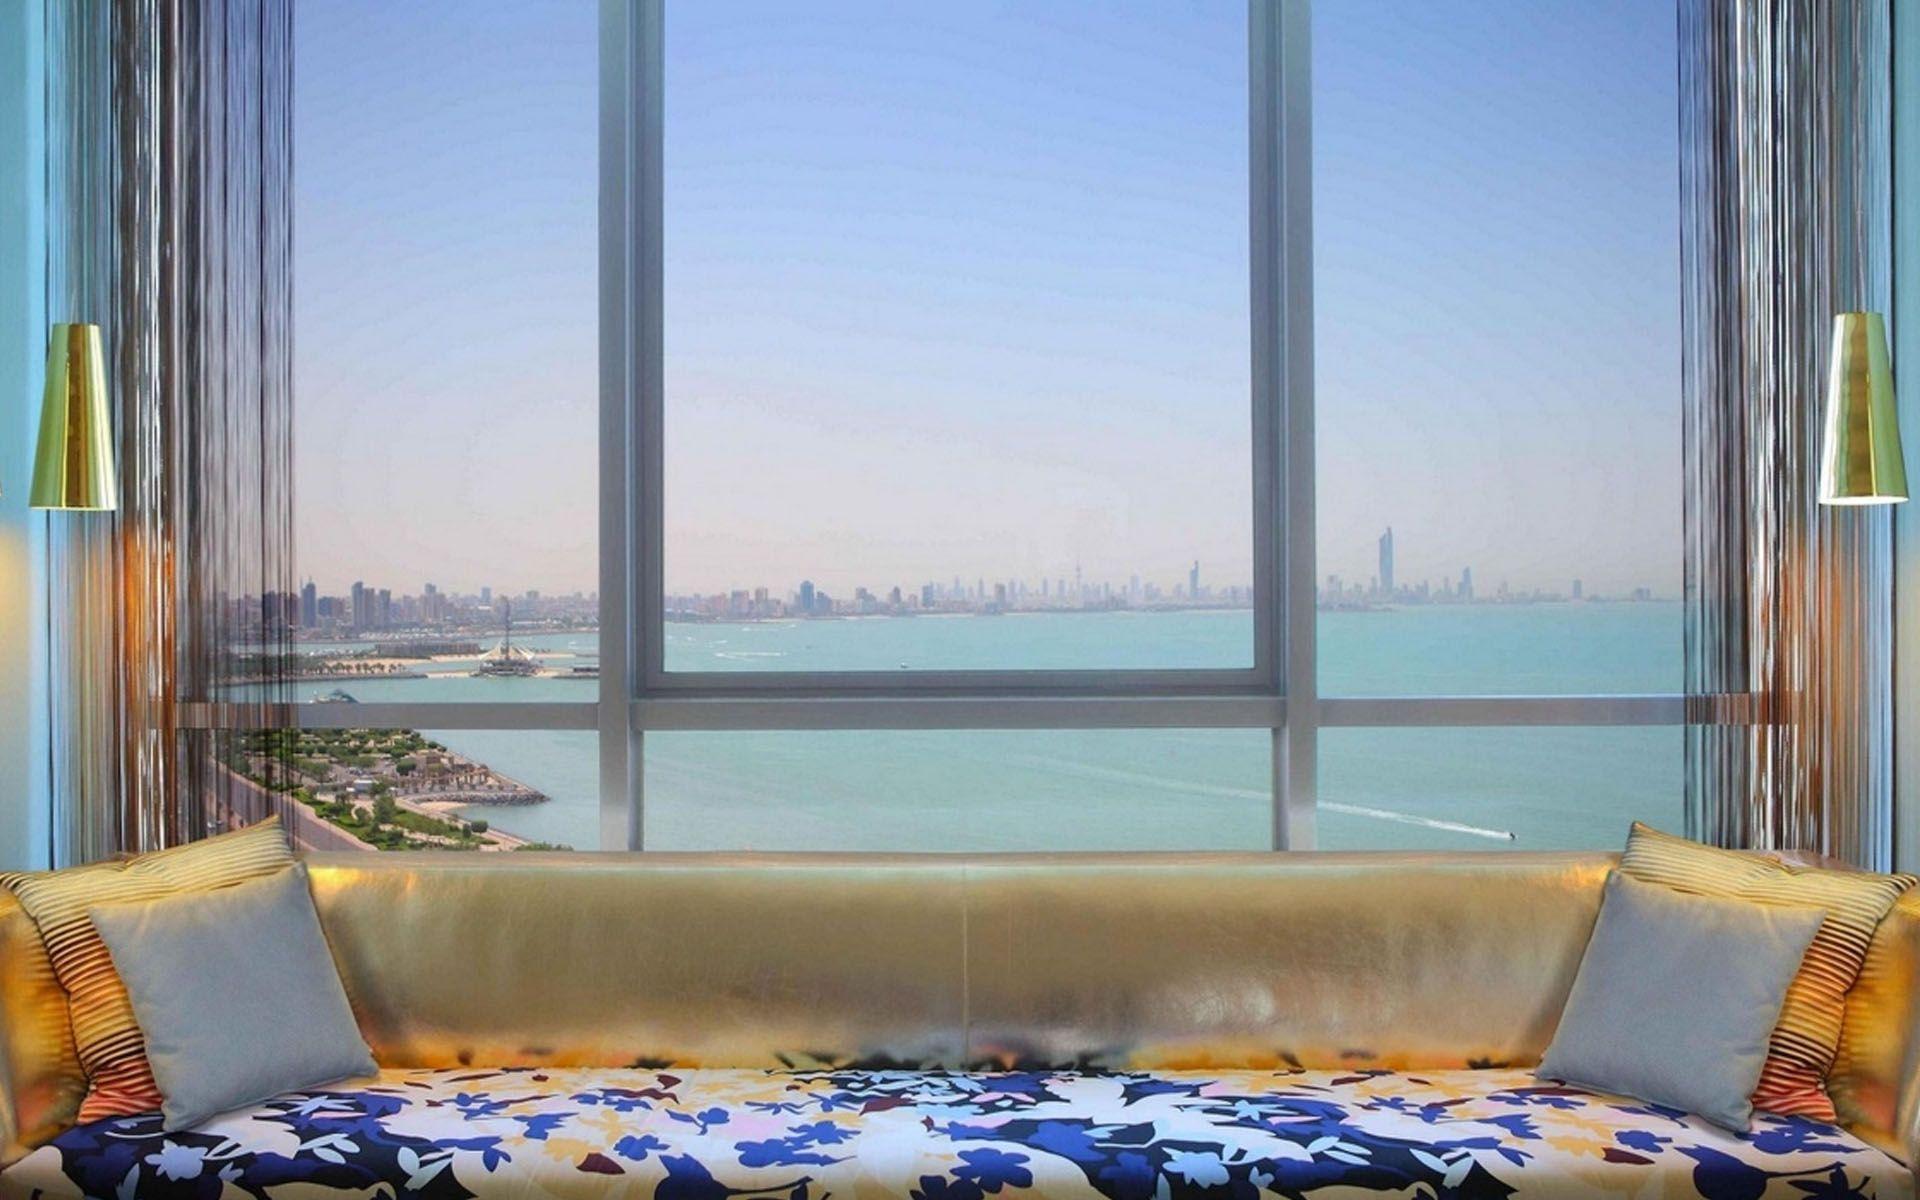 Modern interior design concept hd wallpaper also latest wallpapers rh pinterest